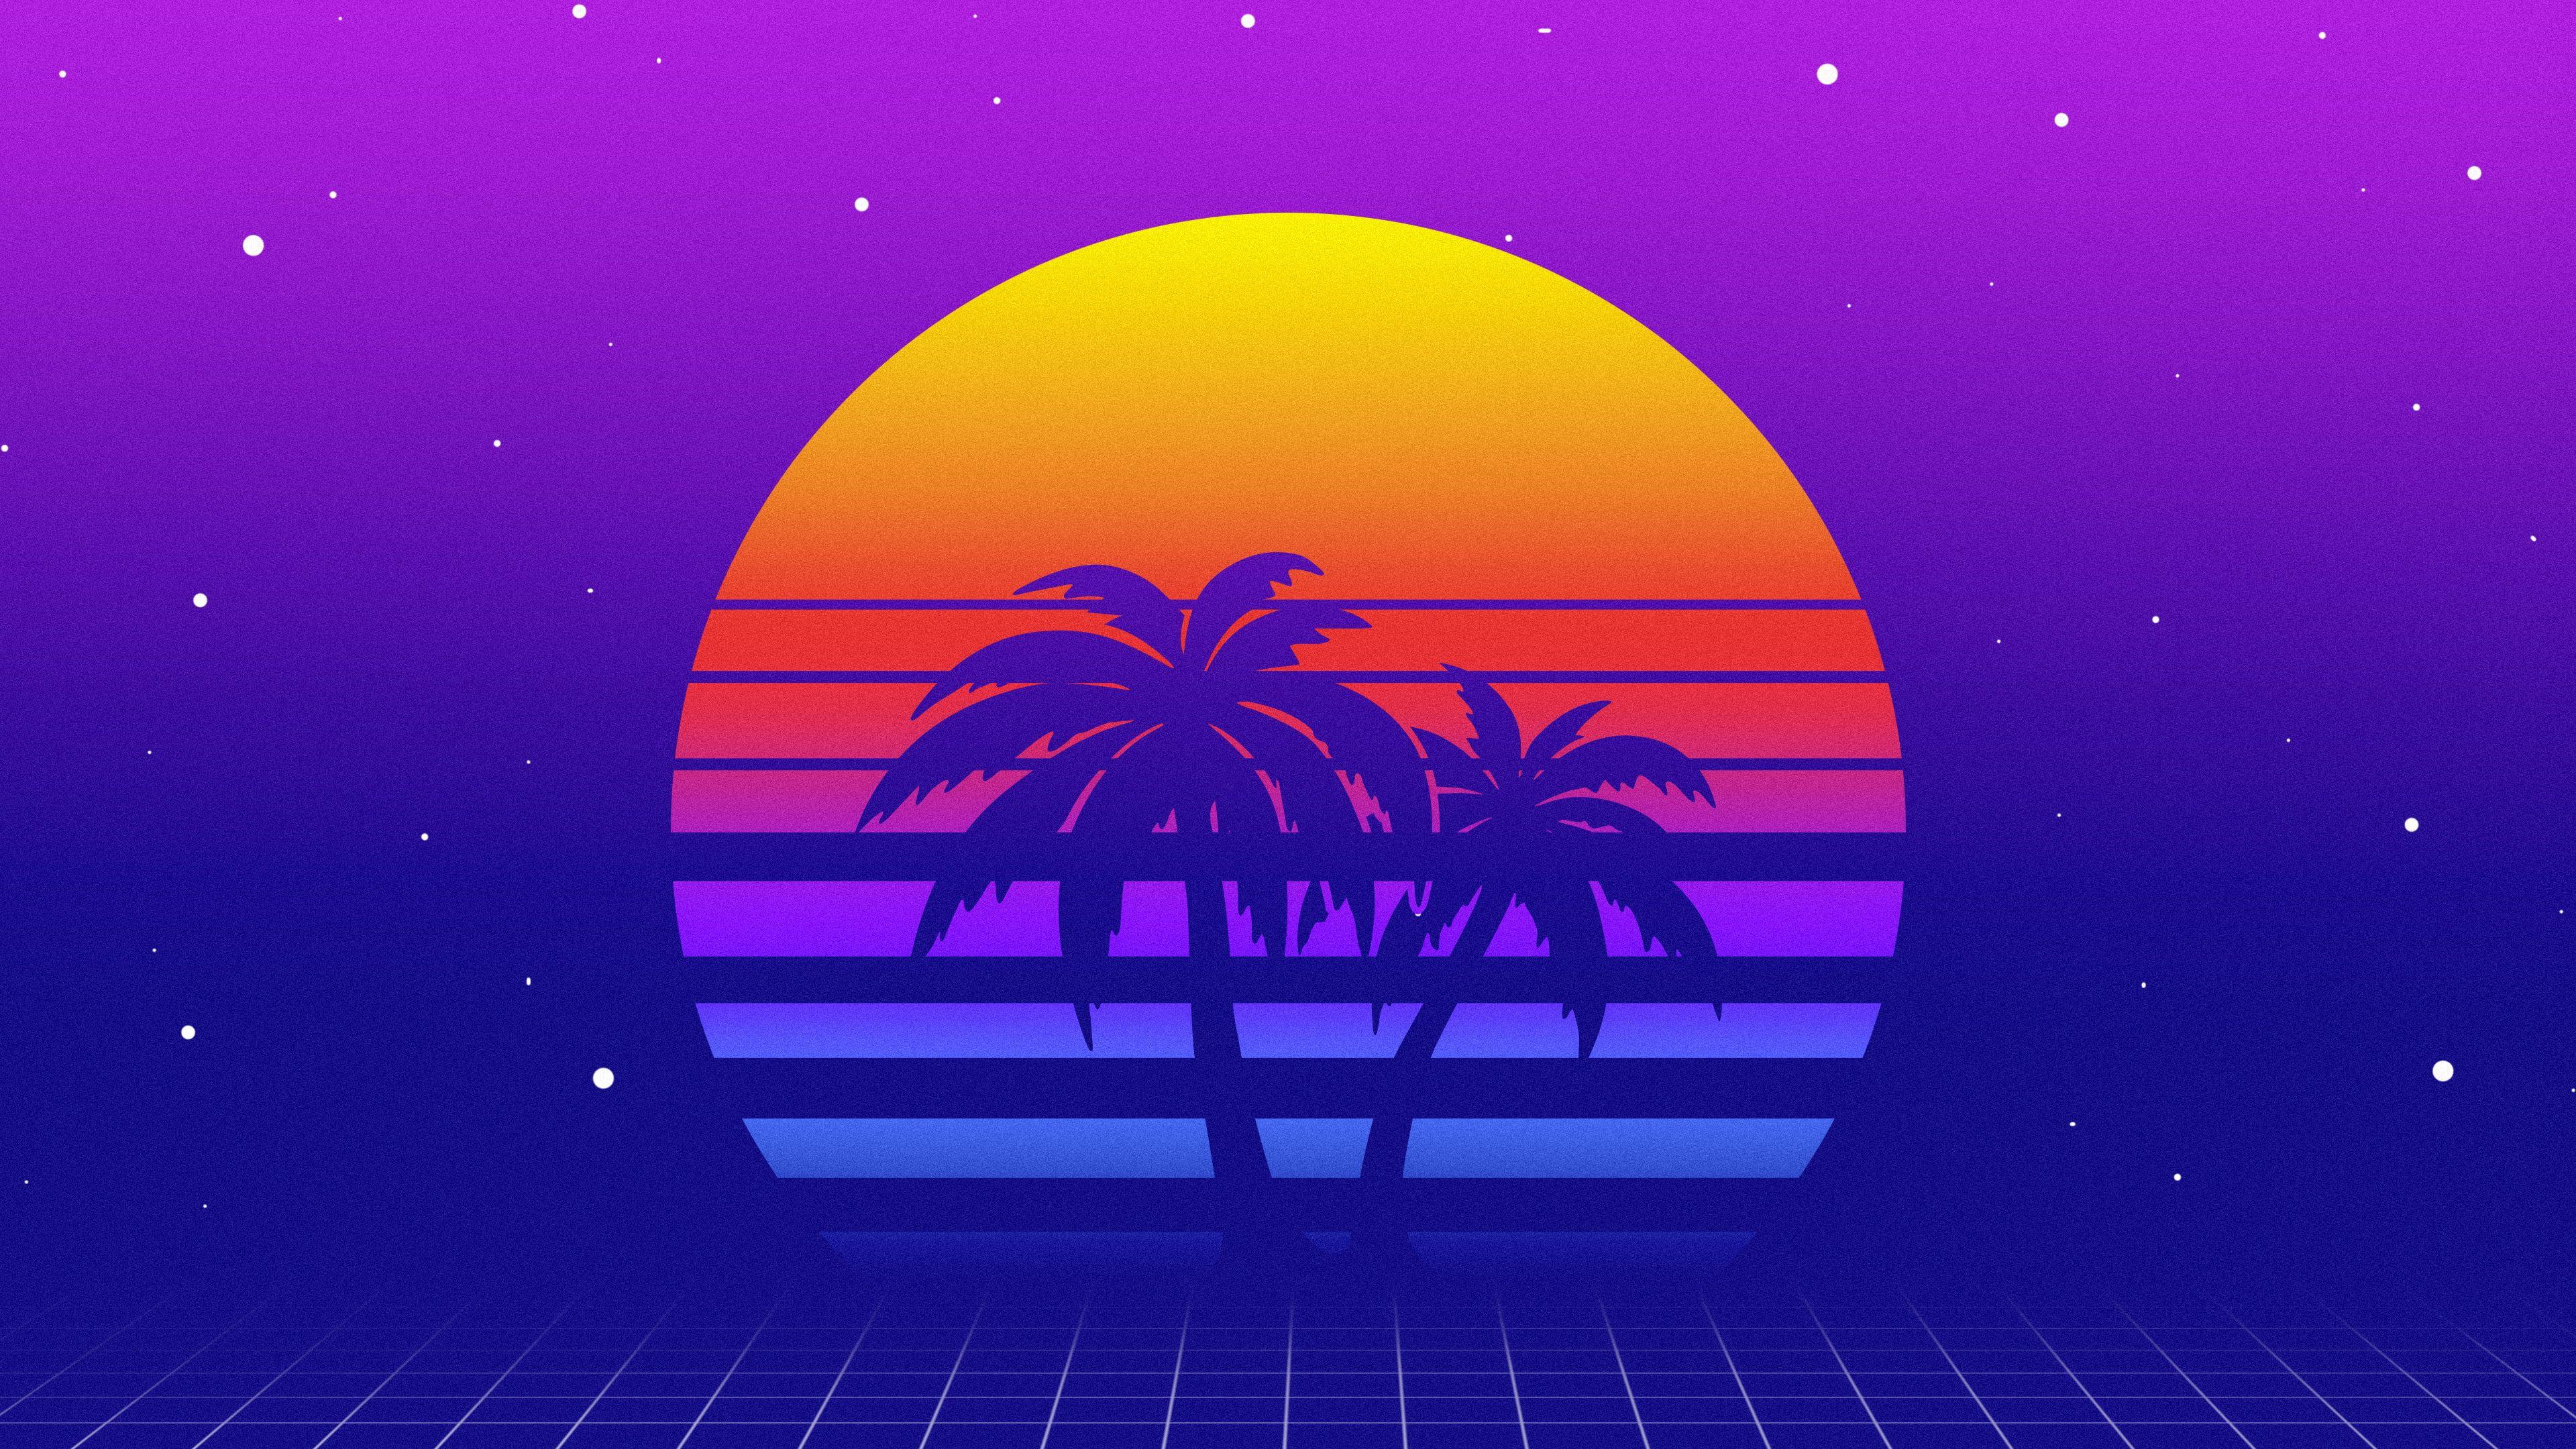 Sunset Retrowave Digital Art Synthwave 4k Wallpaper Hdwallpaper Desktop Synthwave Digital Art Hd Wallpaper